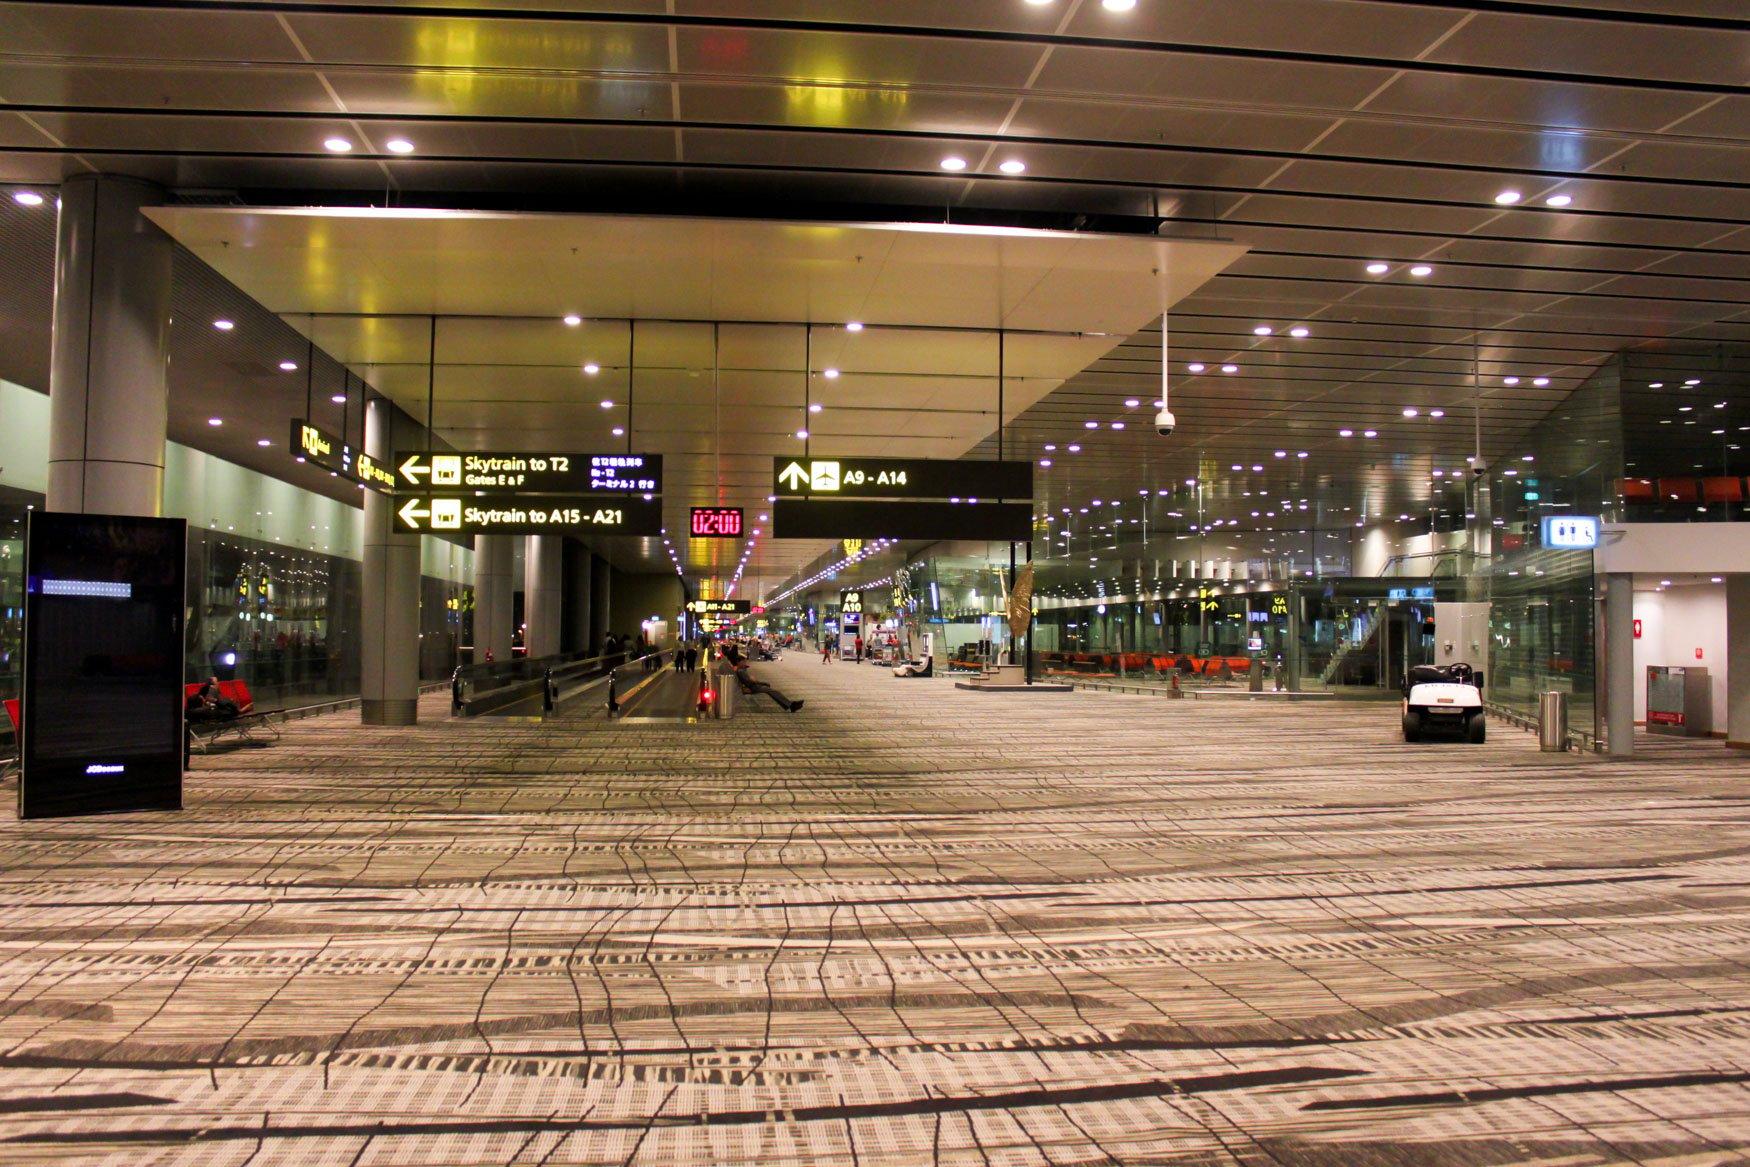 Singapore Changi Airport Terminal